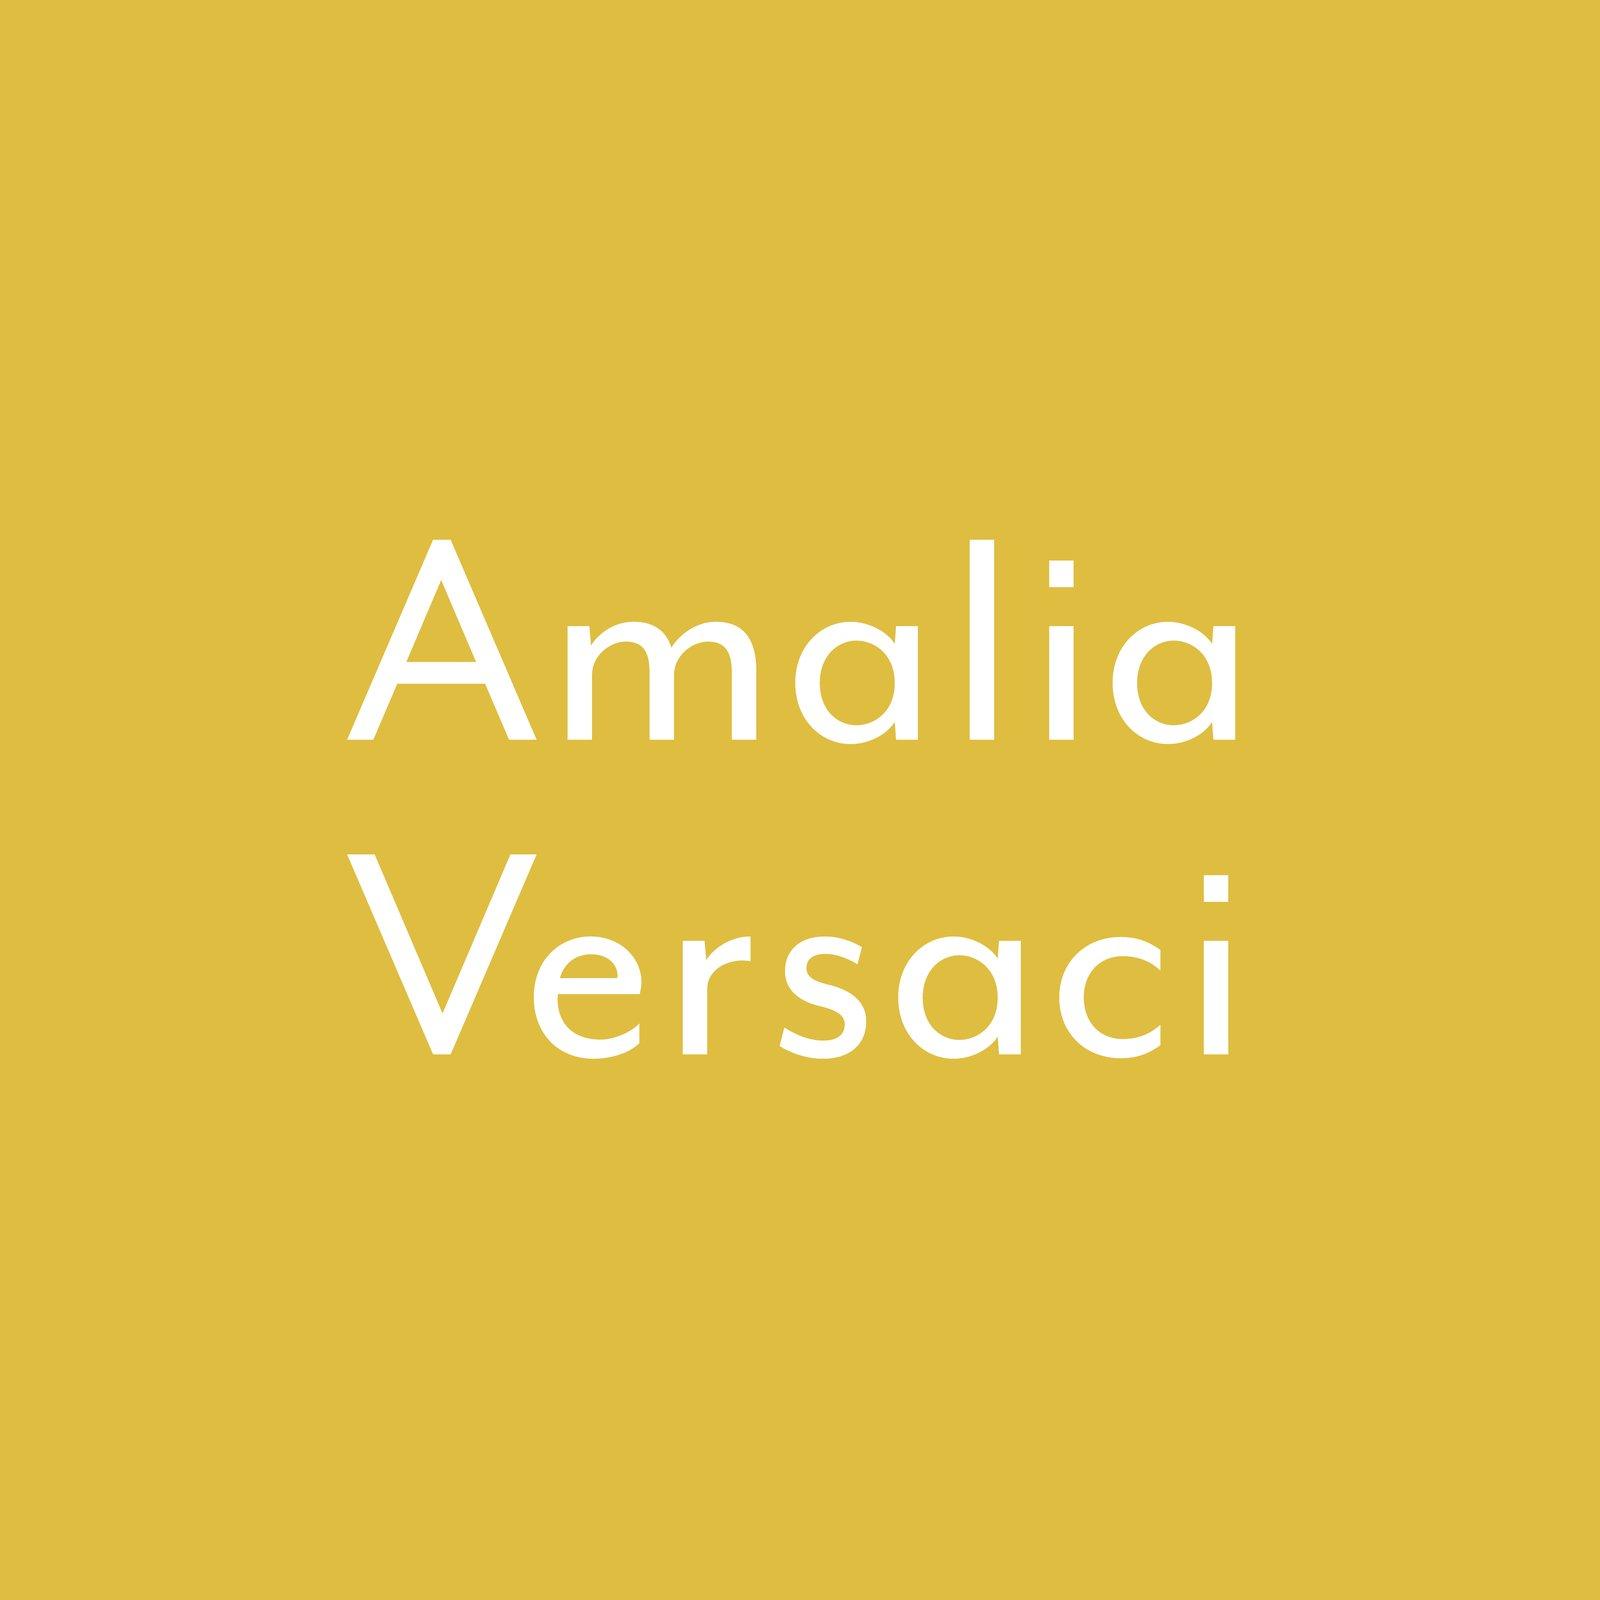 Amalia Versaci